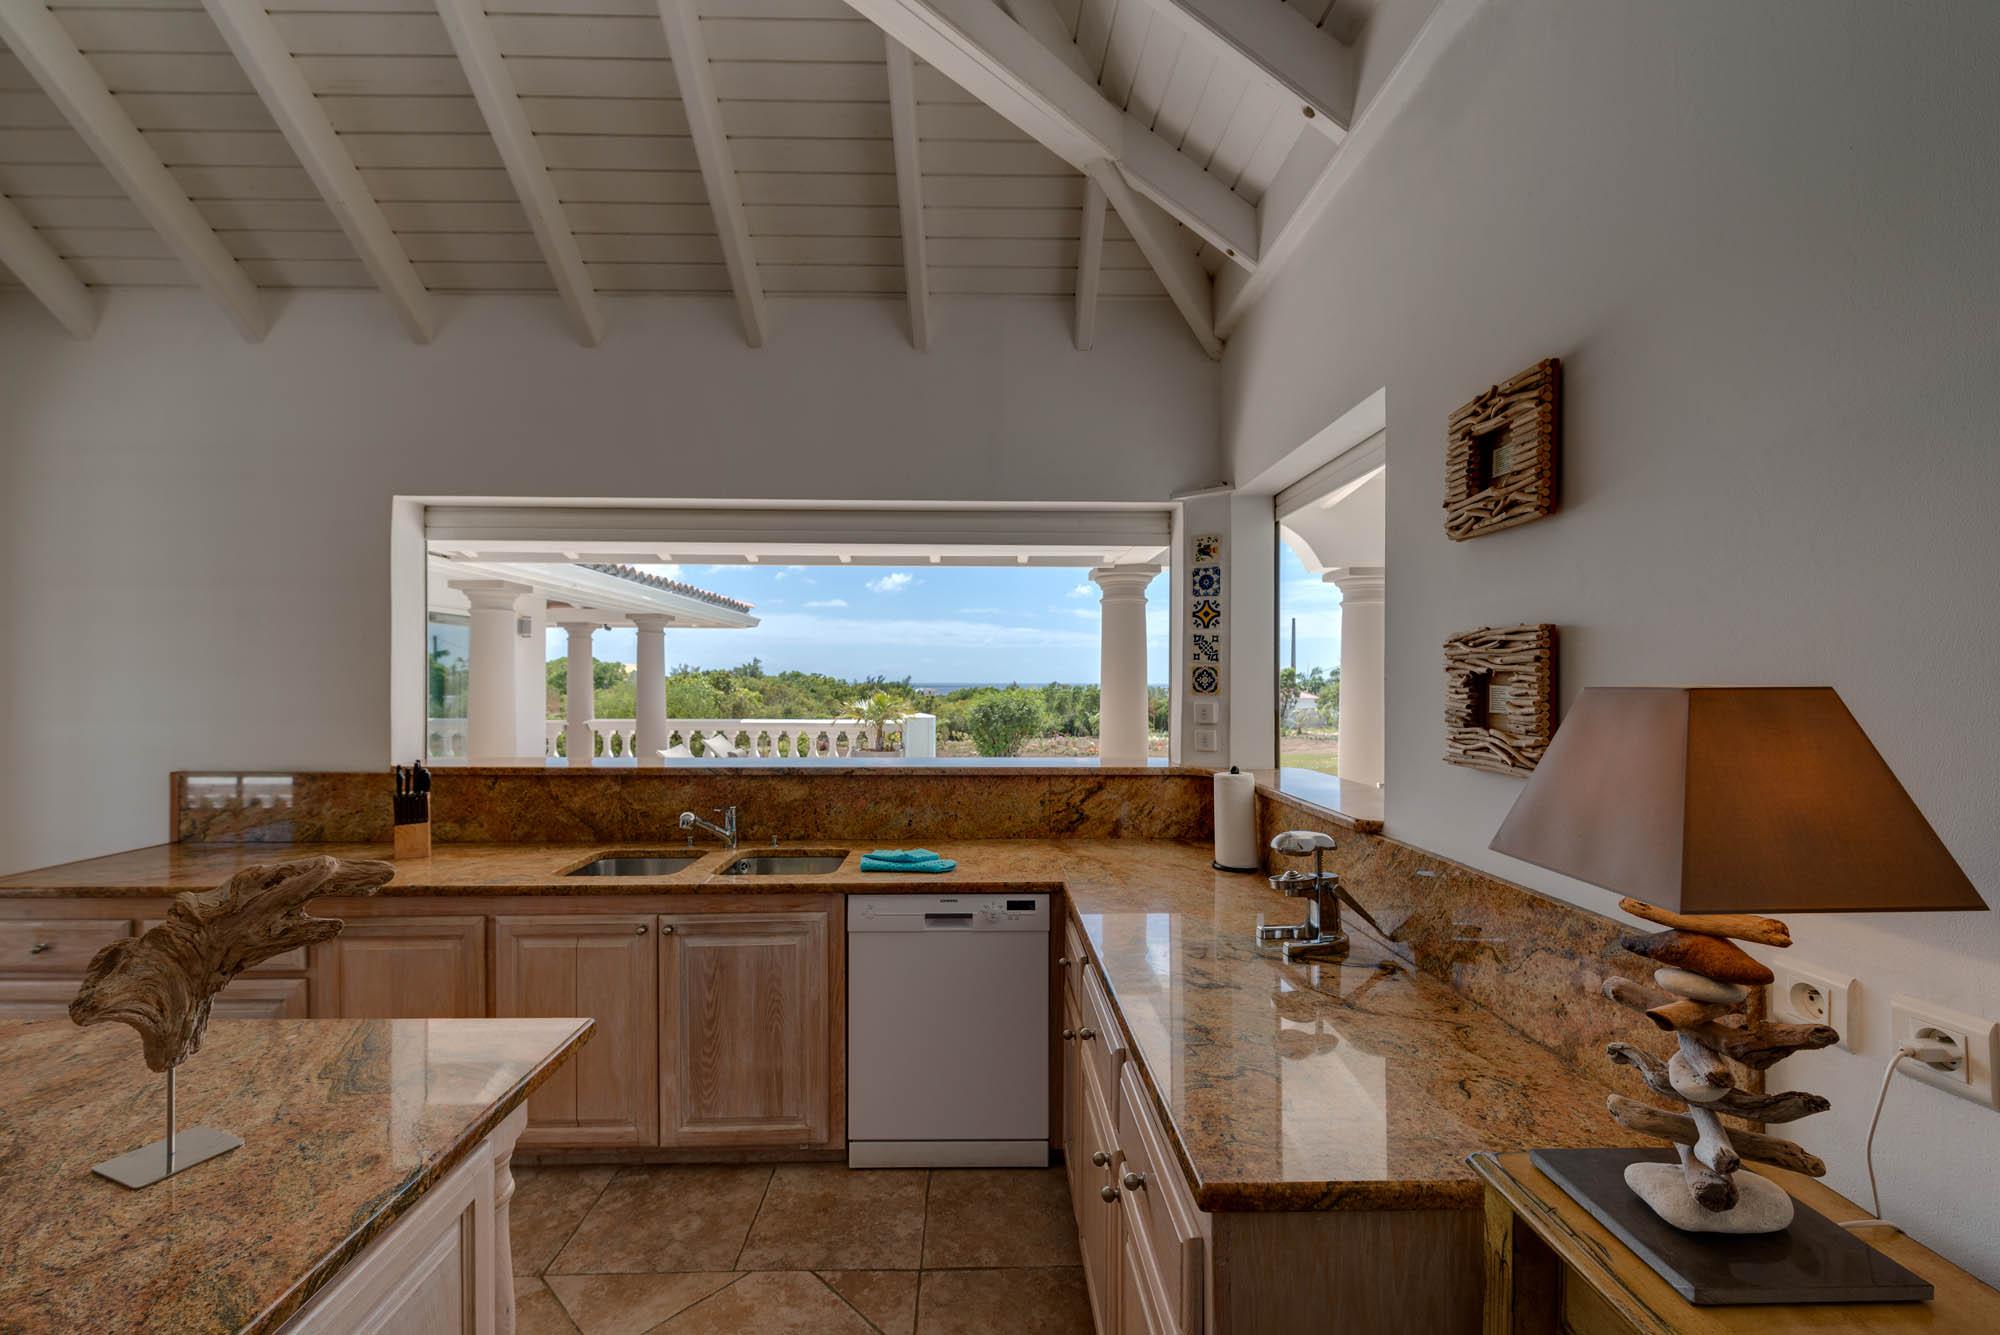 La Bastide villa rental, Baie Longue, Terres-Basses, Saint Martin, Caribbean has a beautifully desgined kitchen.